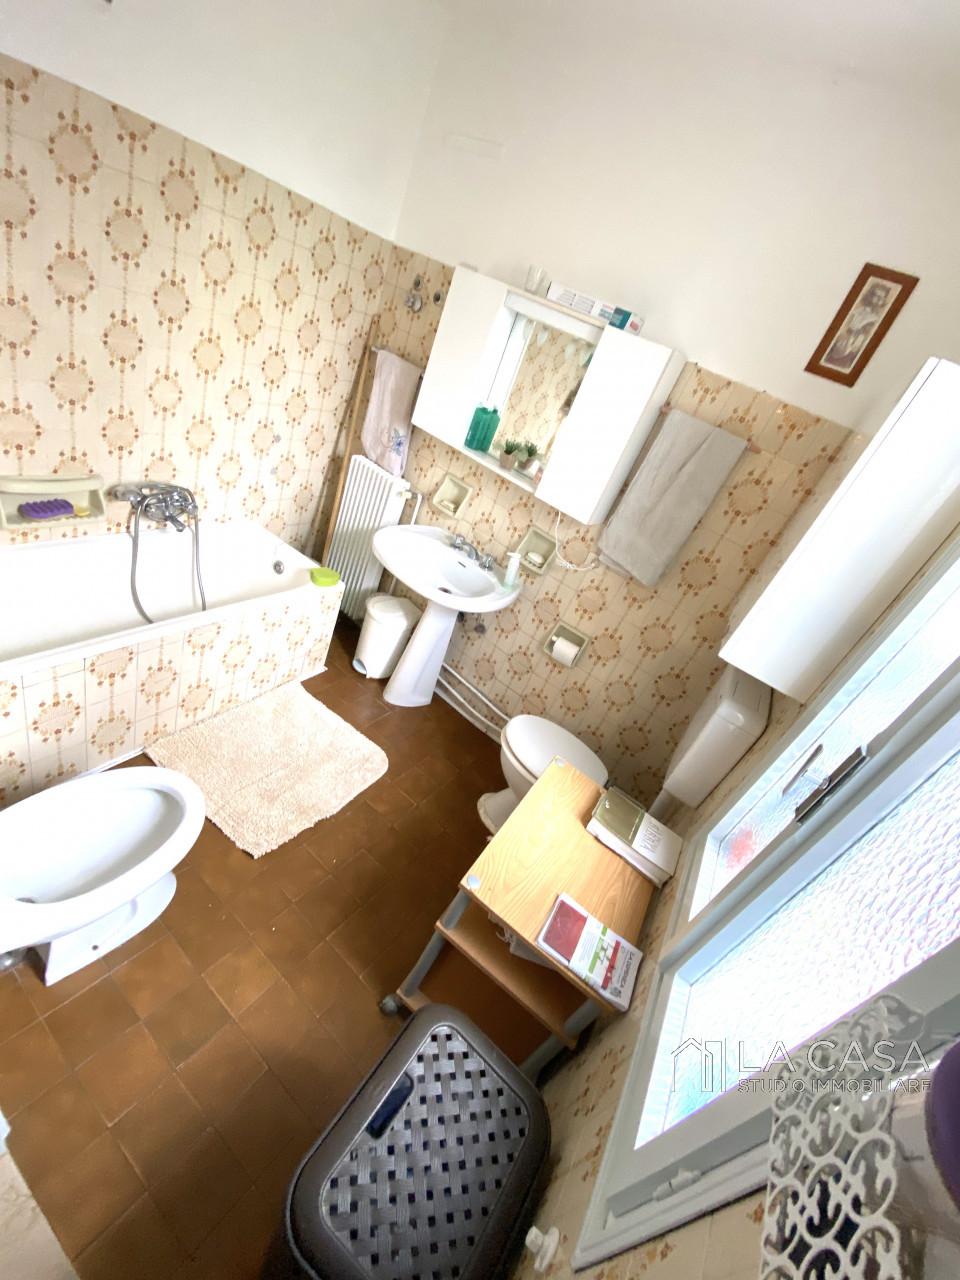 Palazzo plurifamiliare in vendita a Valvasone Arzene - Rif. P3 https://images.gestionaleimmobiliare.it/foto/annunci/200827/2284141/1280x1280/015__img_3711_wmk_0.jpg